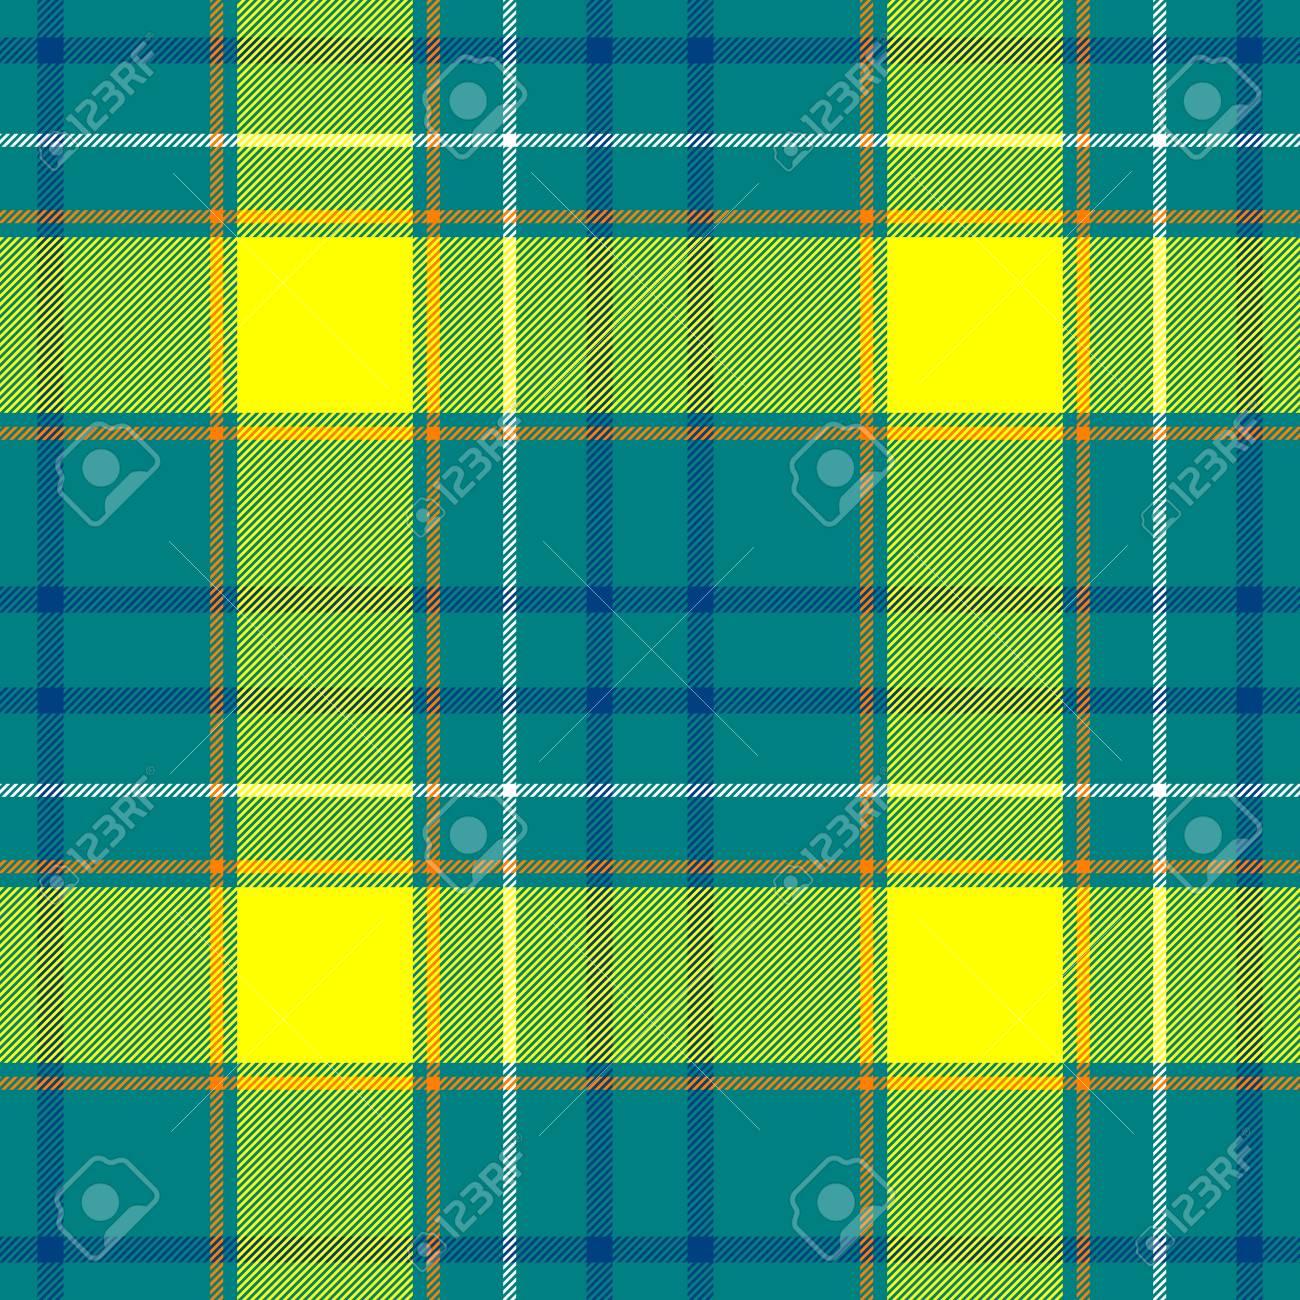 5f8feb3180 checked diamond tartan plaid scotch kilt fabric seamless pattern texture  background - teal, blue green